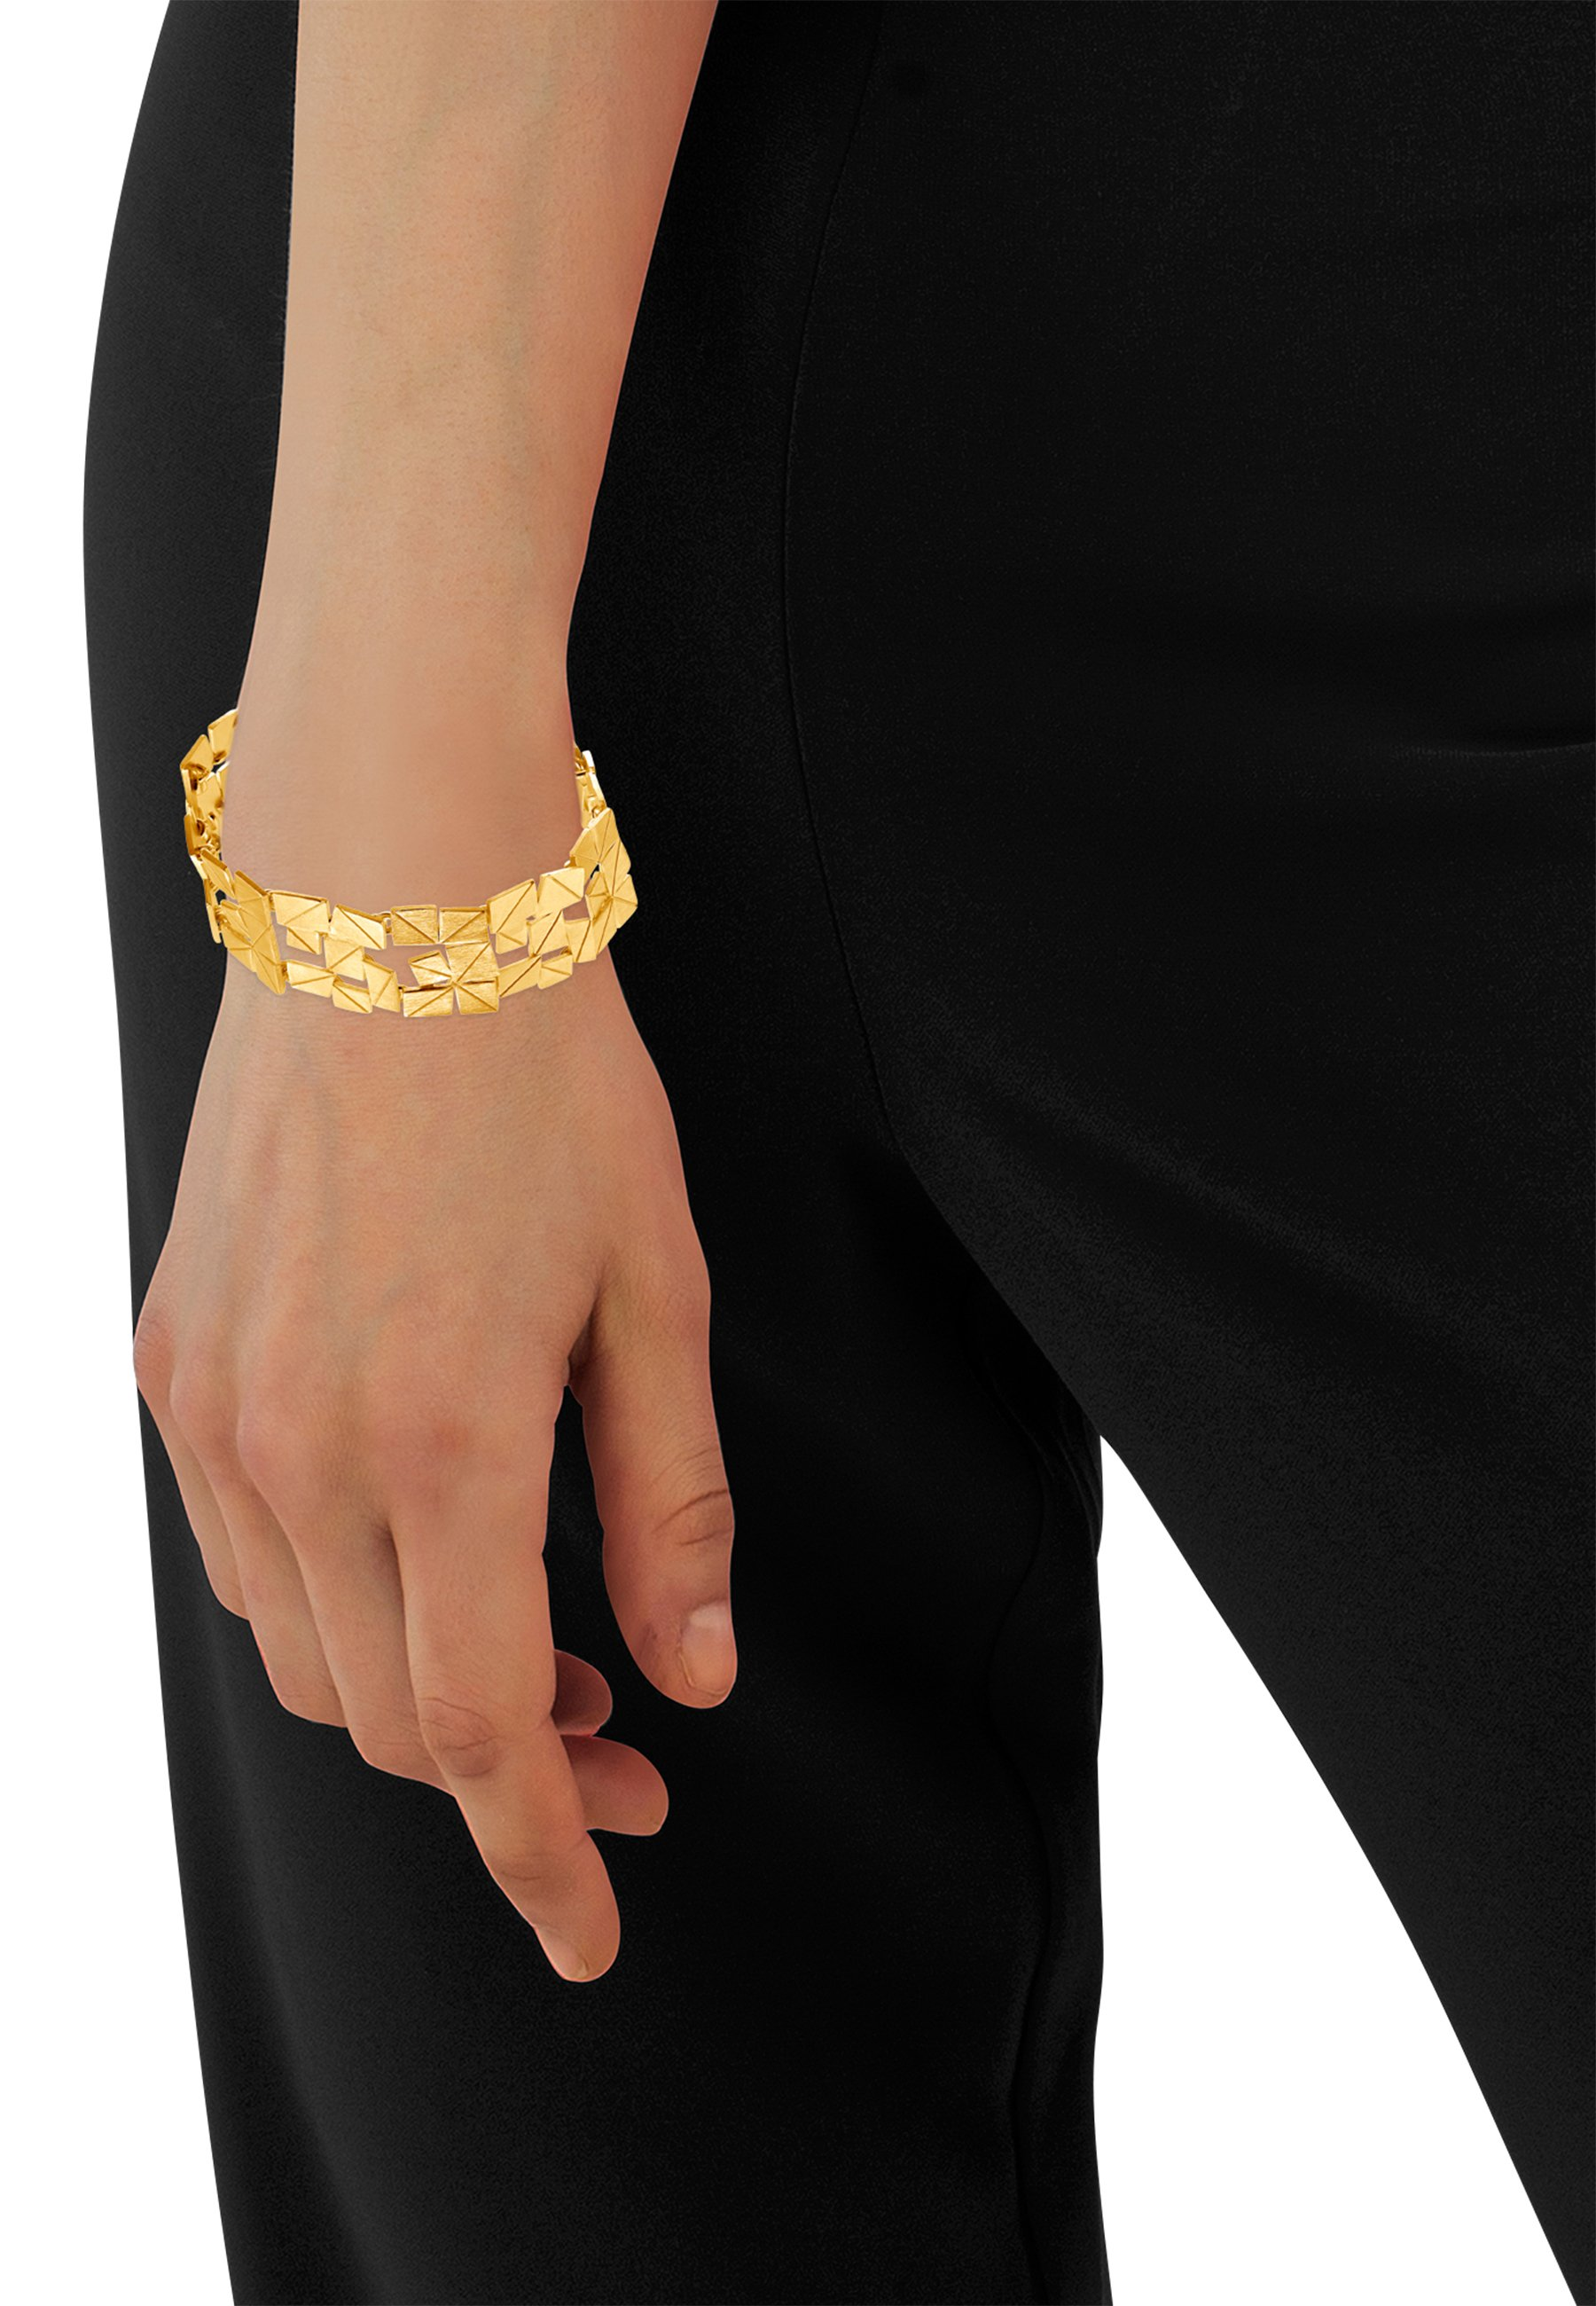 Femme PARTIS - Bracelet